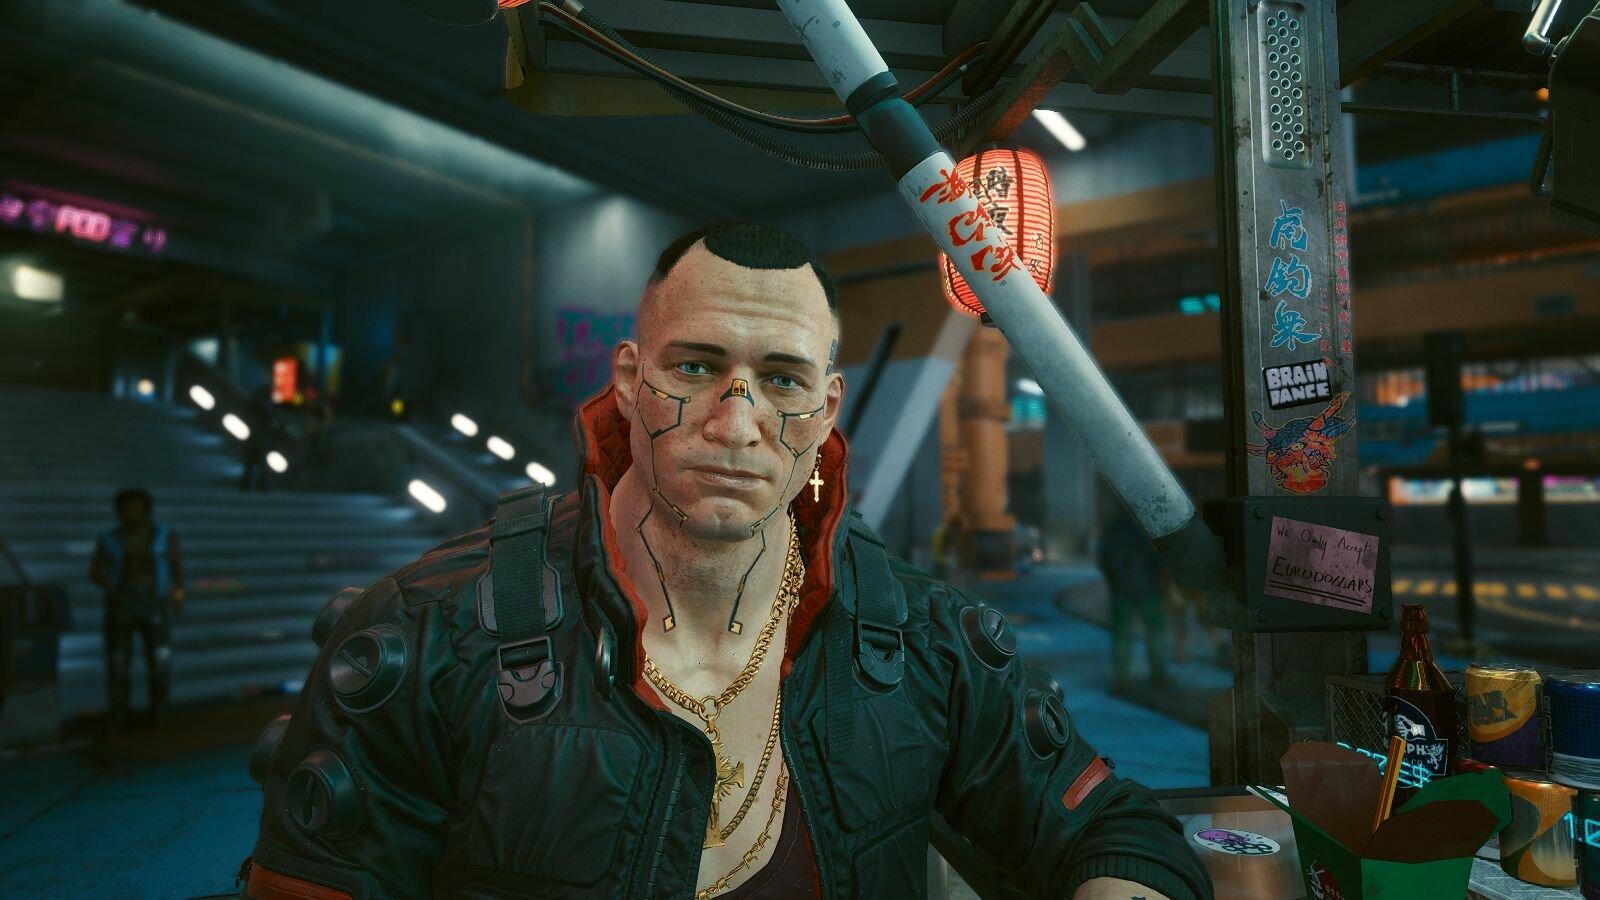 Джеки неплохой мужик! Cyberpunk 2077